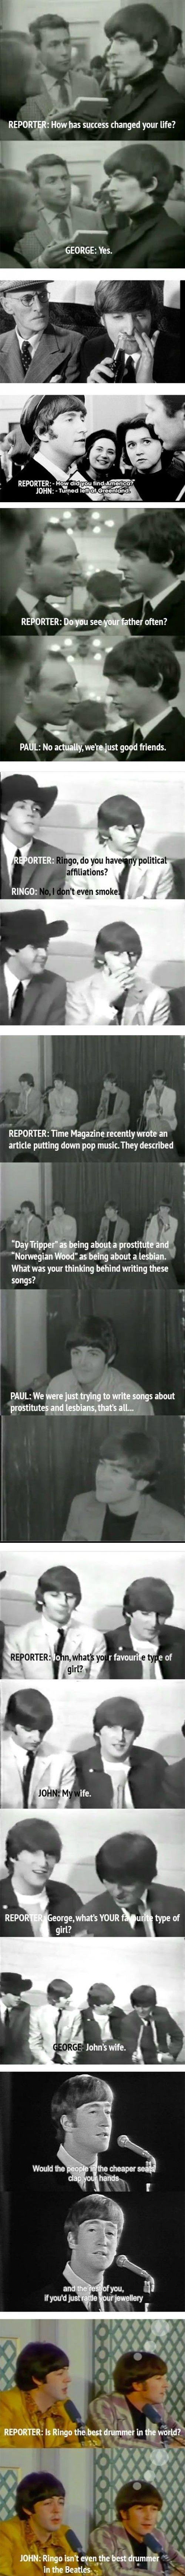 "The Beatles, original Trolls. . REPORTER: we ""? REPORTER: bayou often? PAUL: No actual Music Beatles troll quotes"